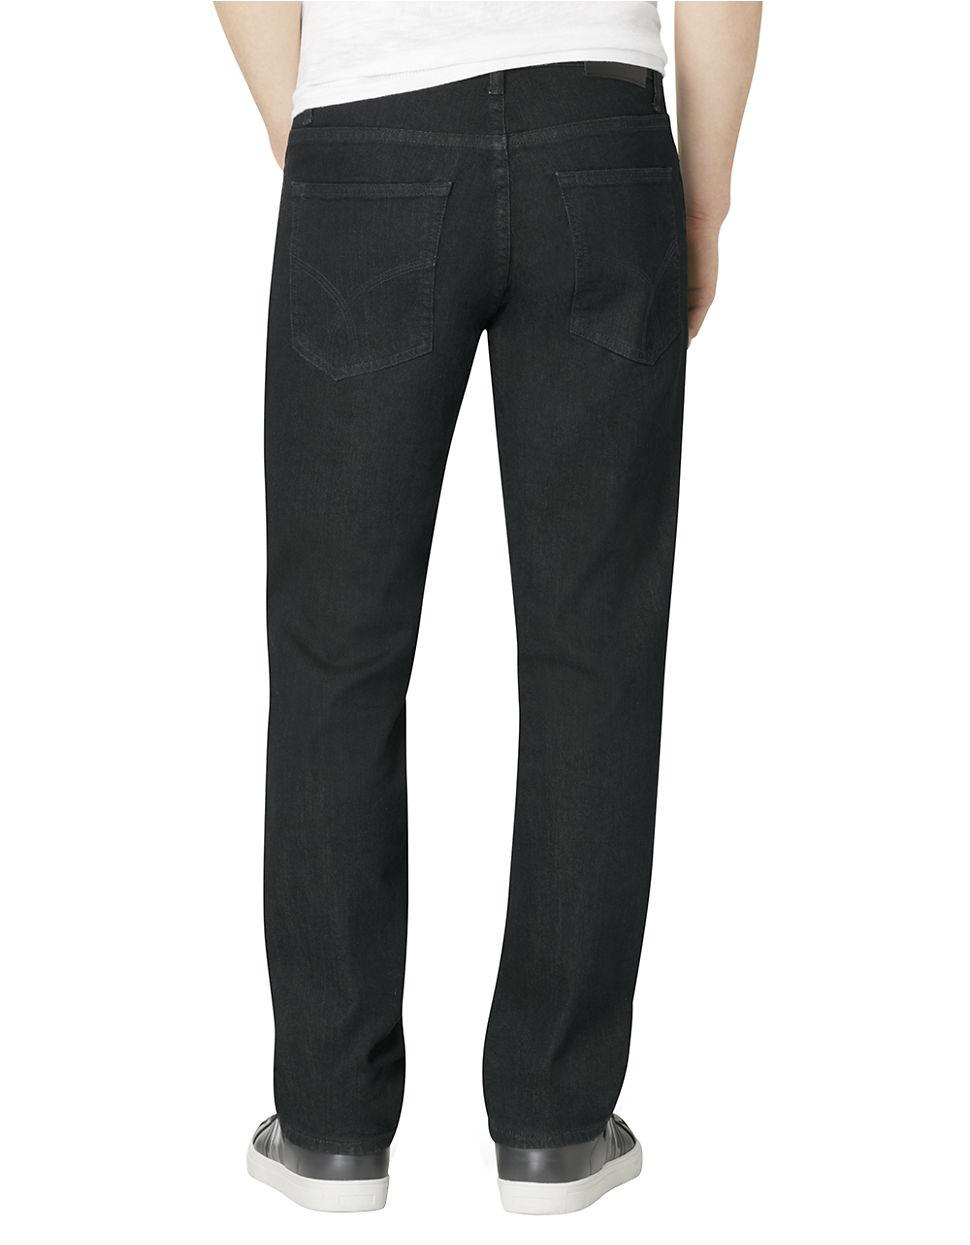 calvin klein jeans slim straight leg jeans in black for. Black Bedroom Furniture Sets. Home Design Ideas